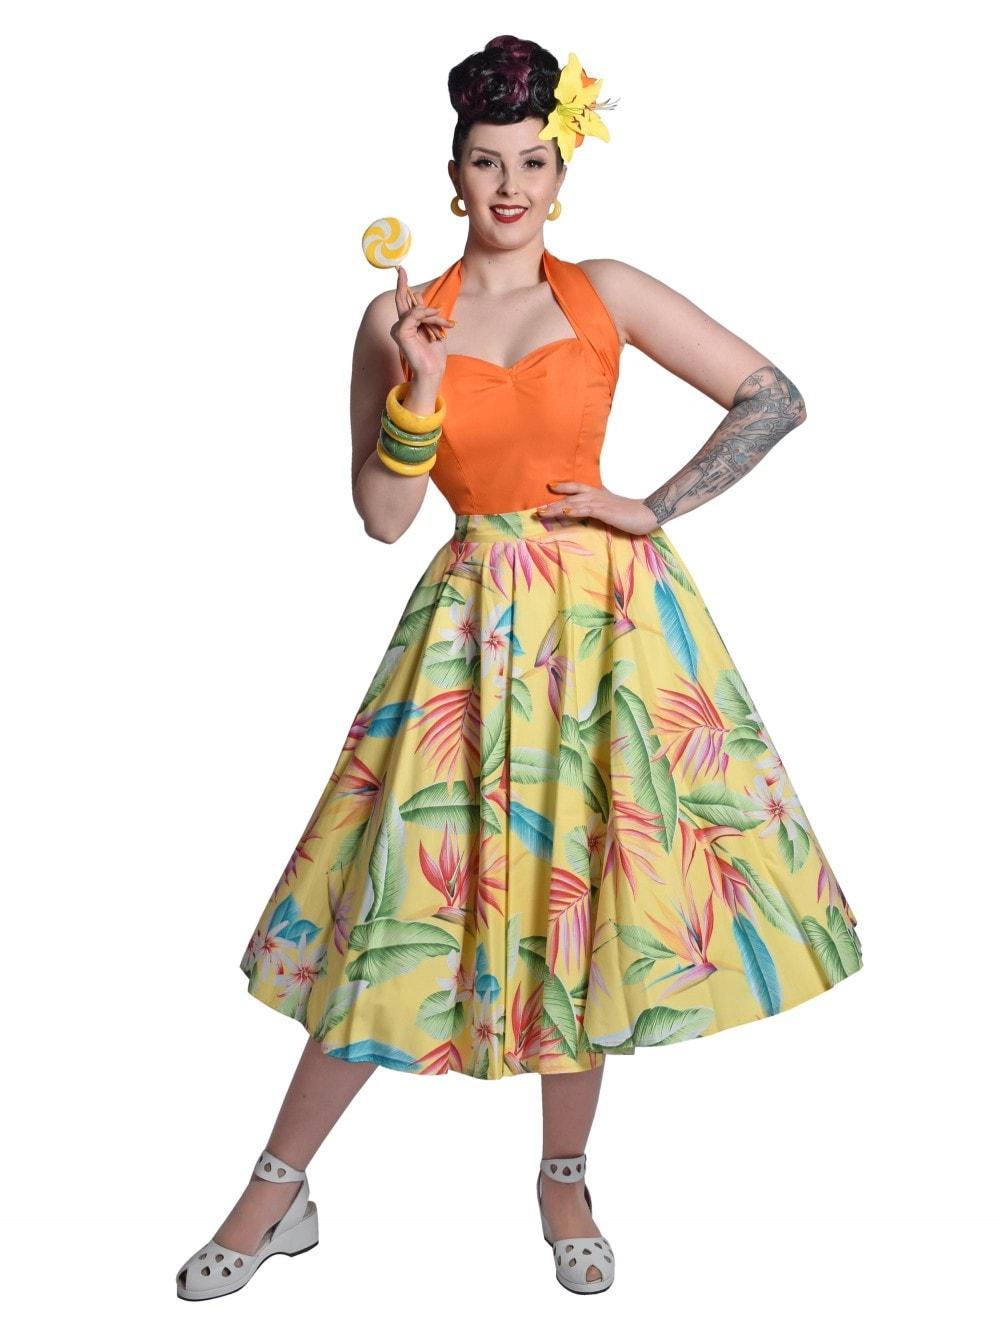 1950s Dress  50s Full Circle Skirt Hawaiian Tropical Floral Print Cotton Dress